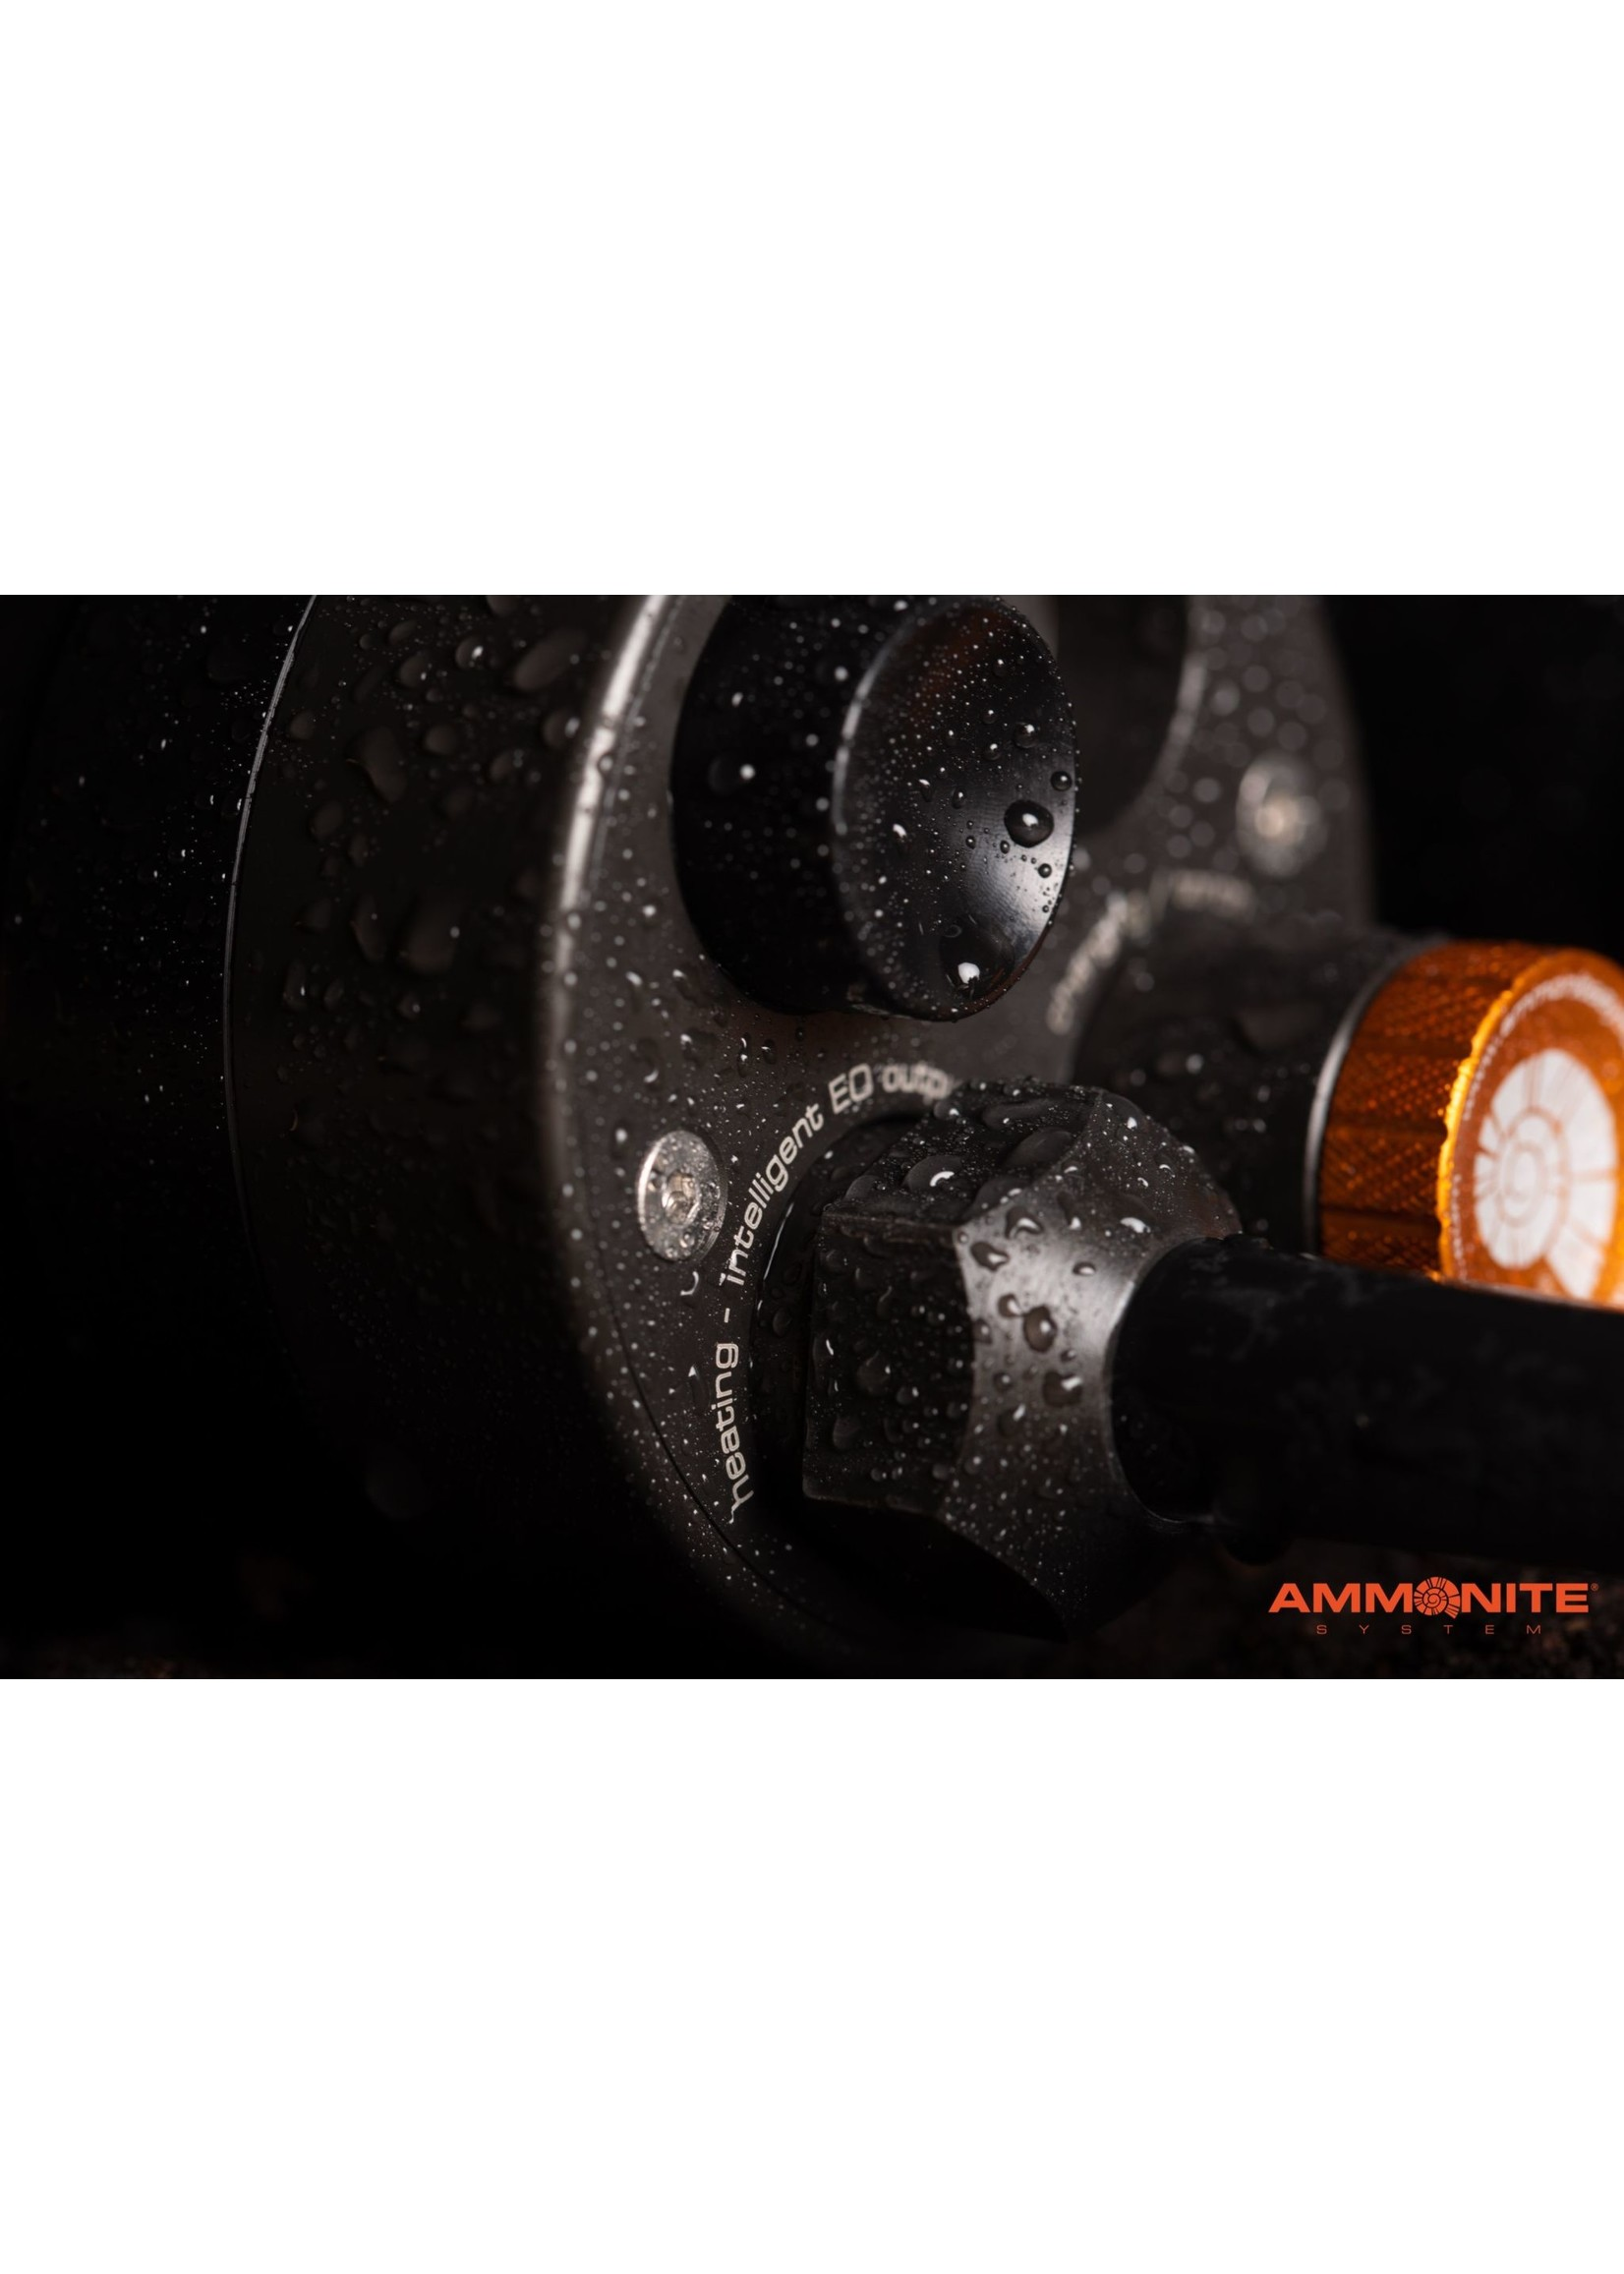 Ammonite Ammonite Accu Thermo - diverse varianten